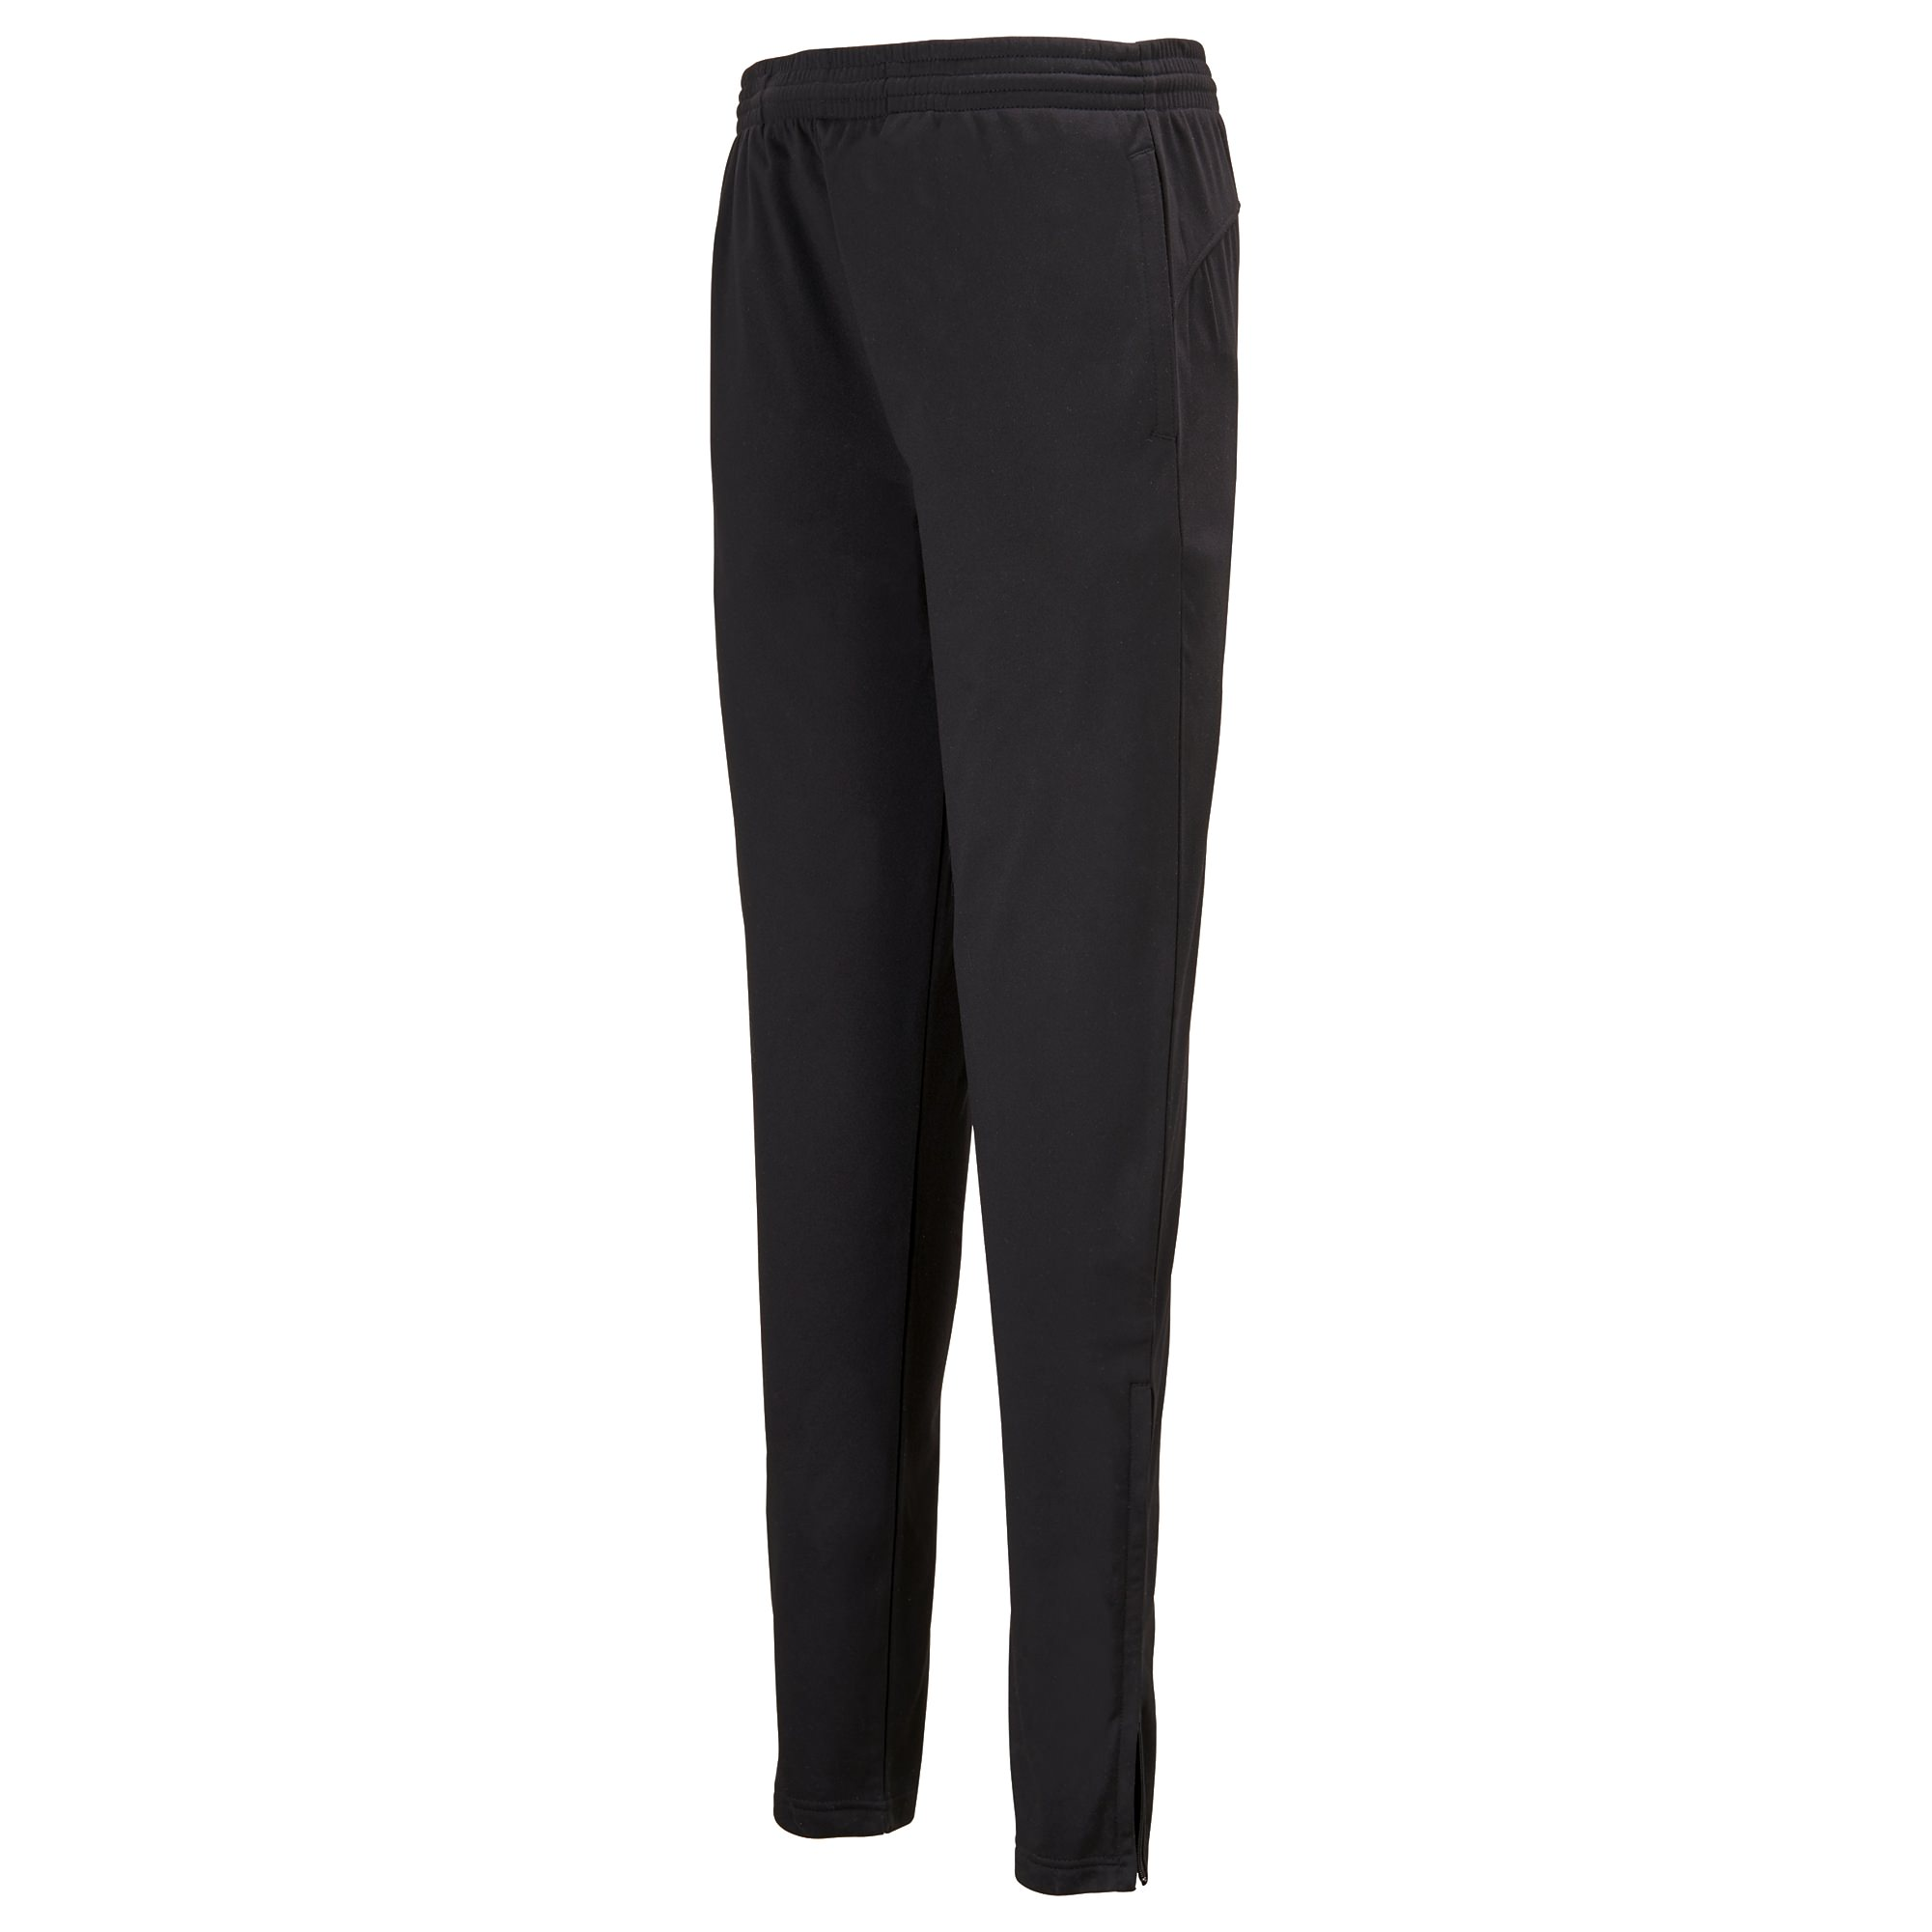 Style 7731 Pants